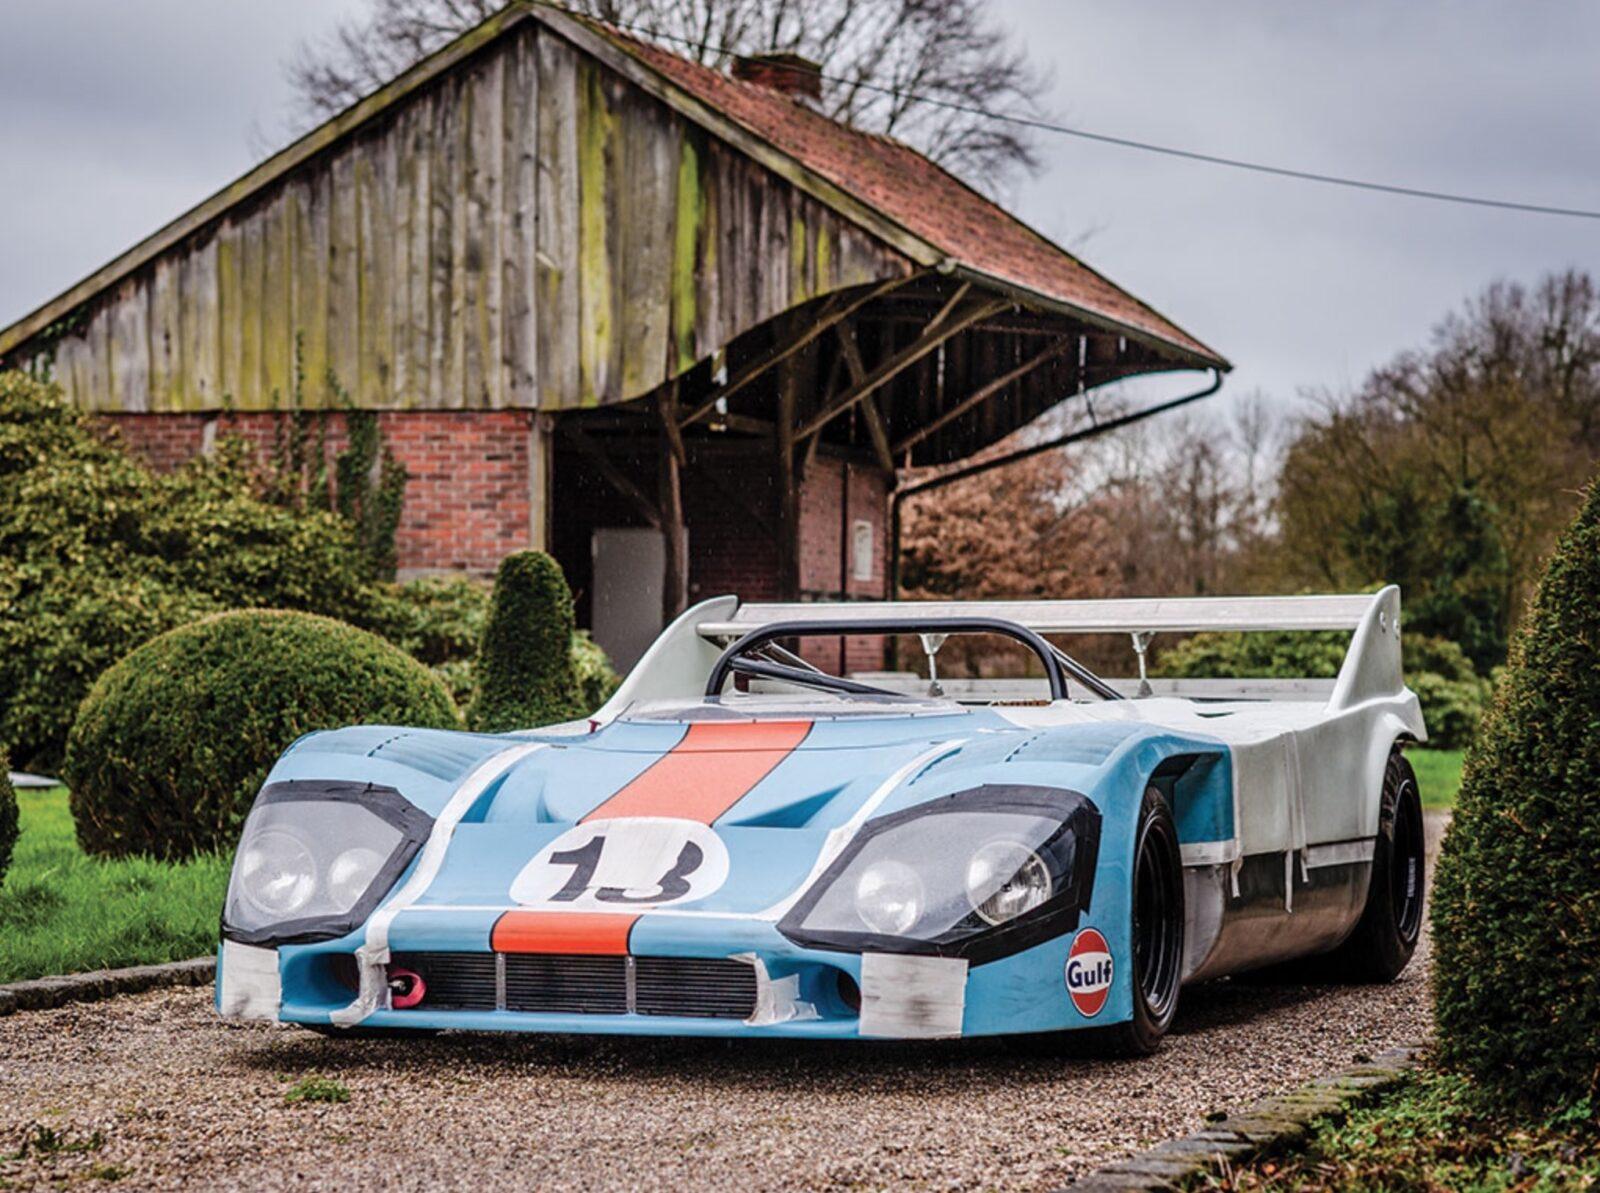 Porsche 91710 Prototype 1 1600x1193 - Porsche 917/10 Prototype